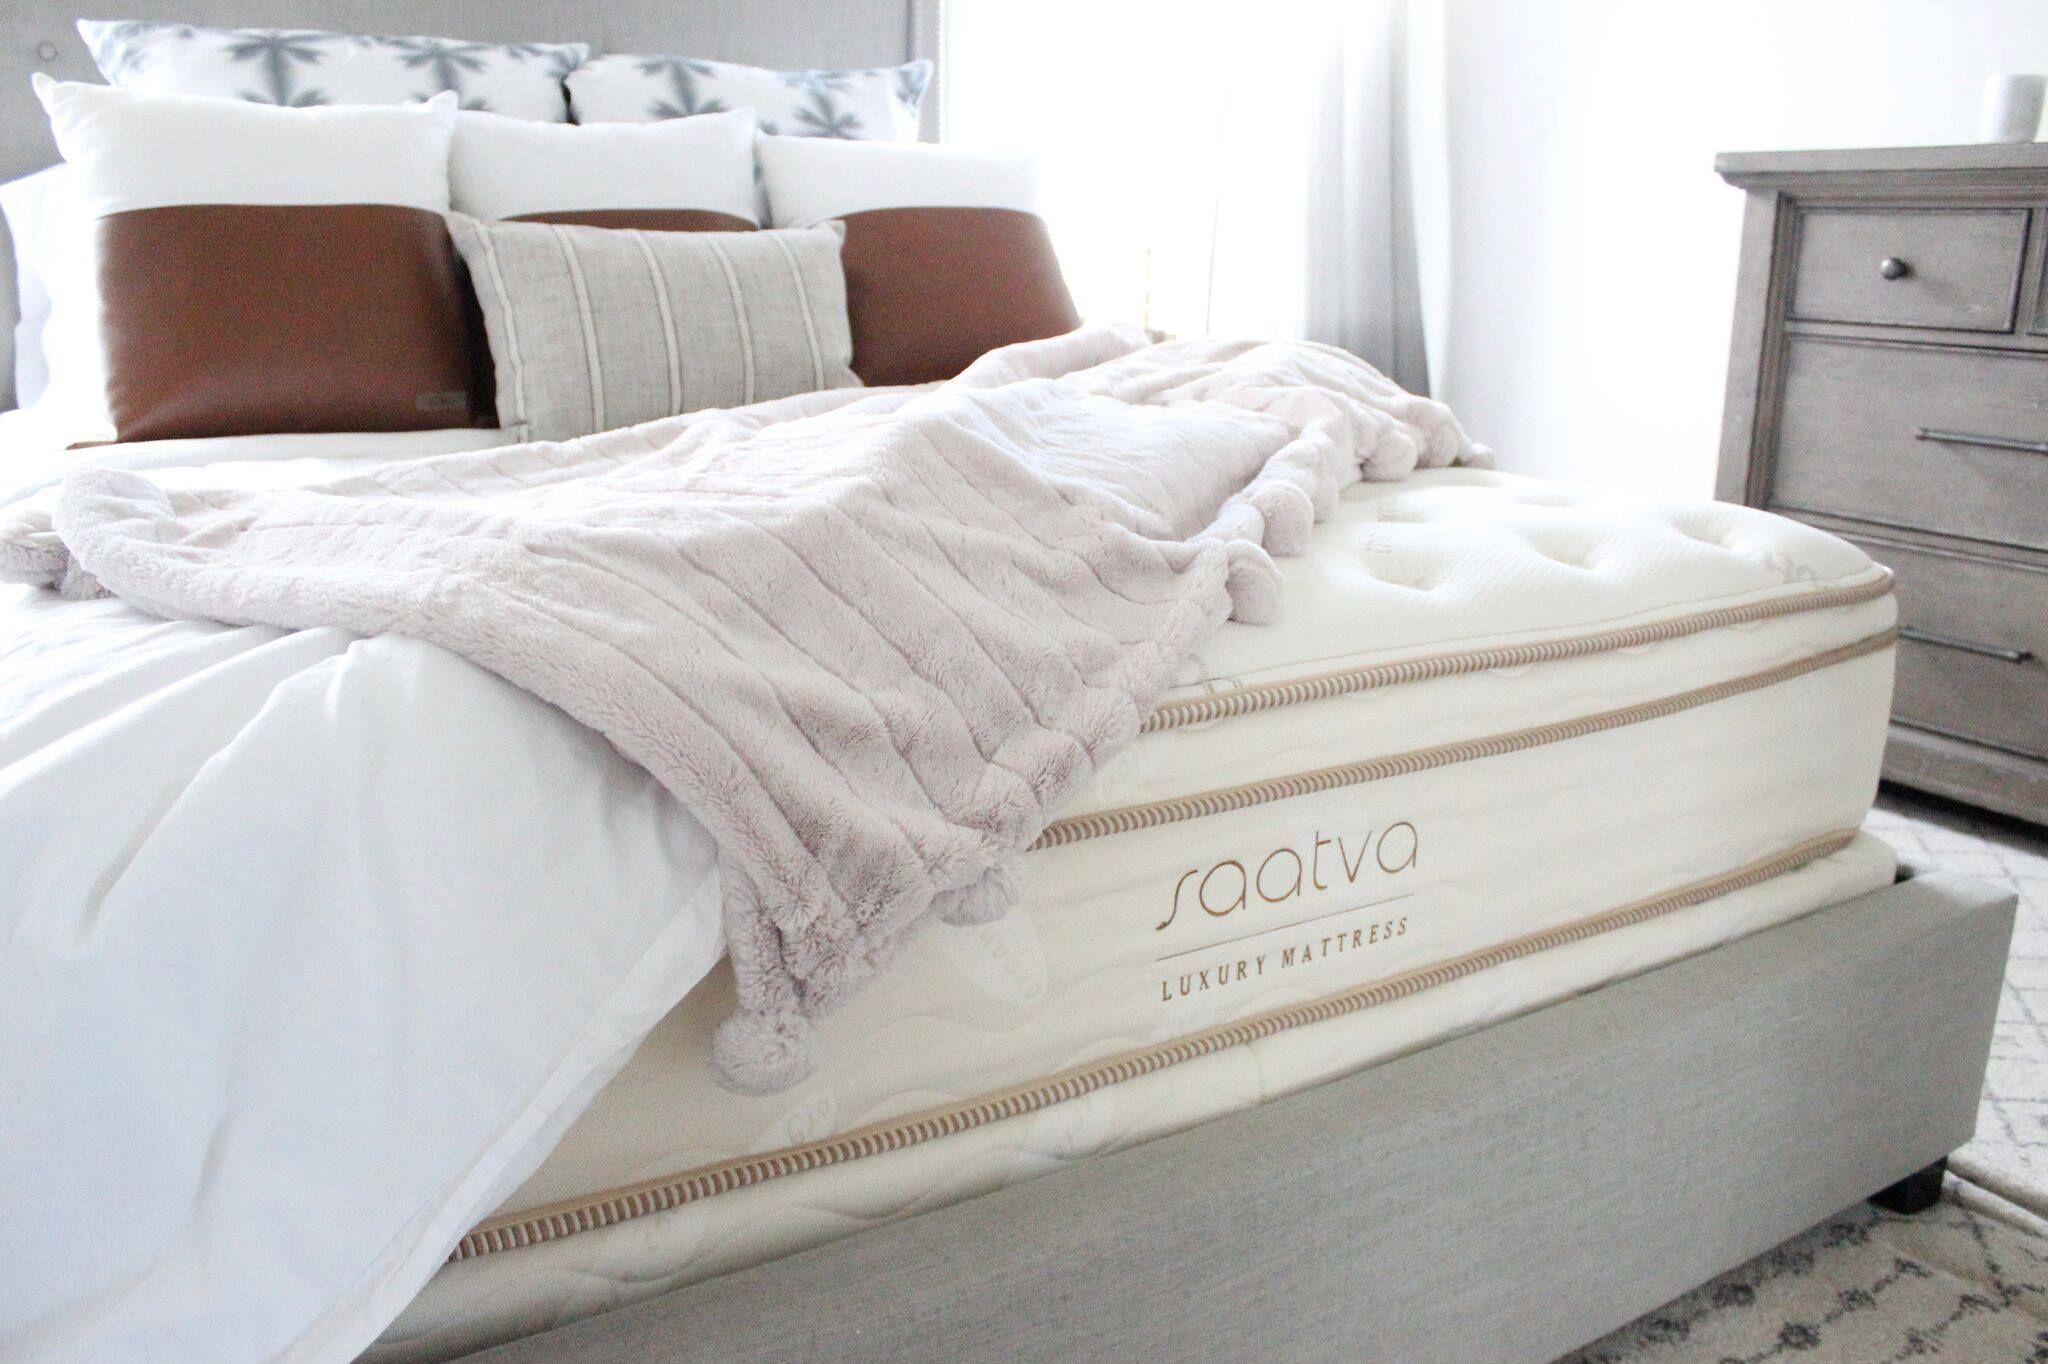 saatva mattress giveaway